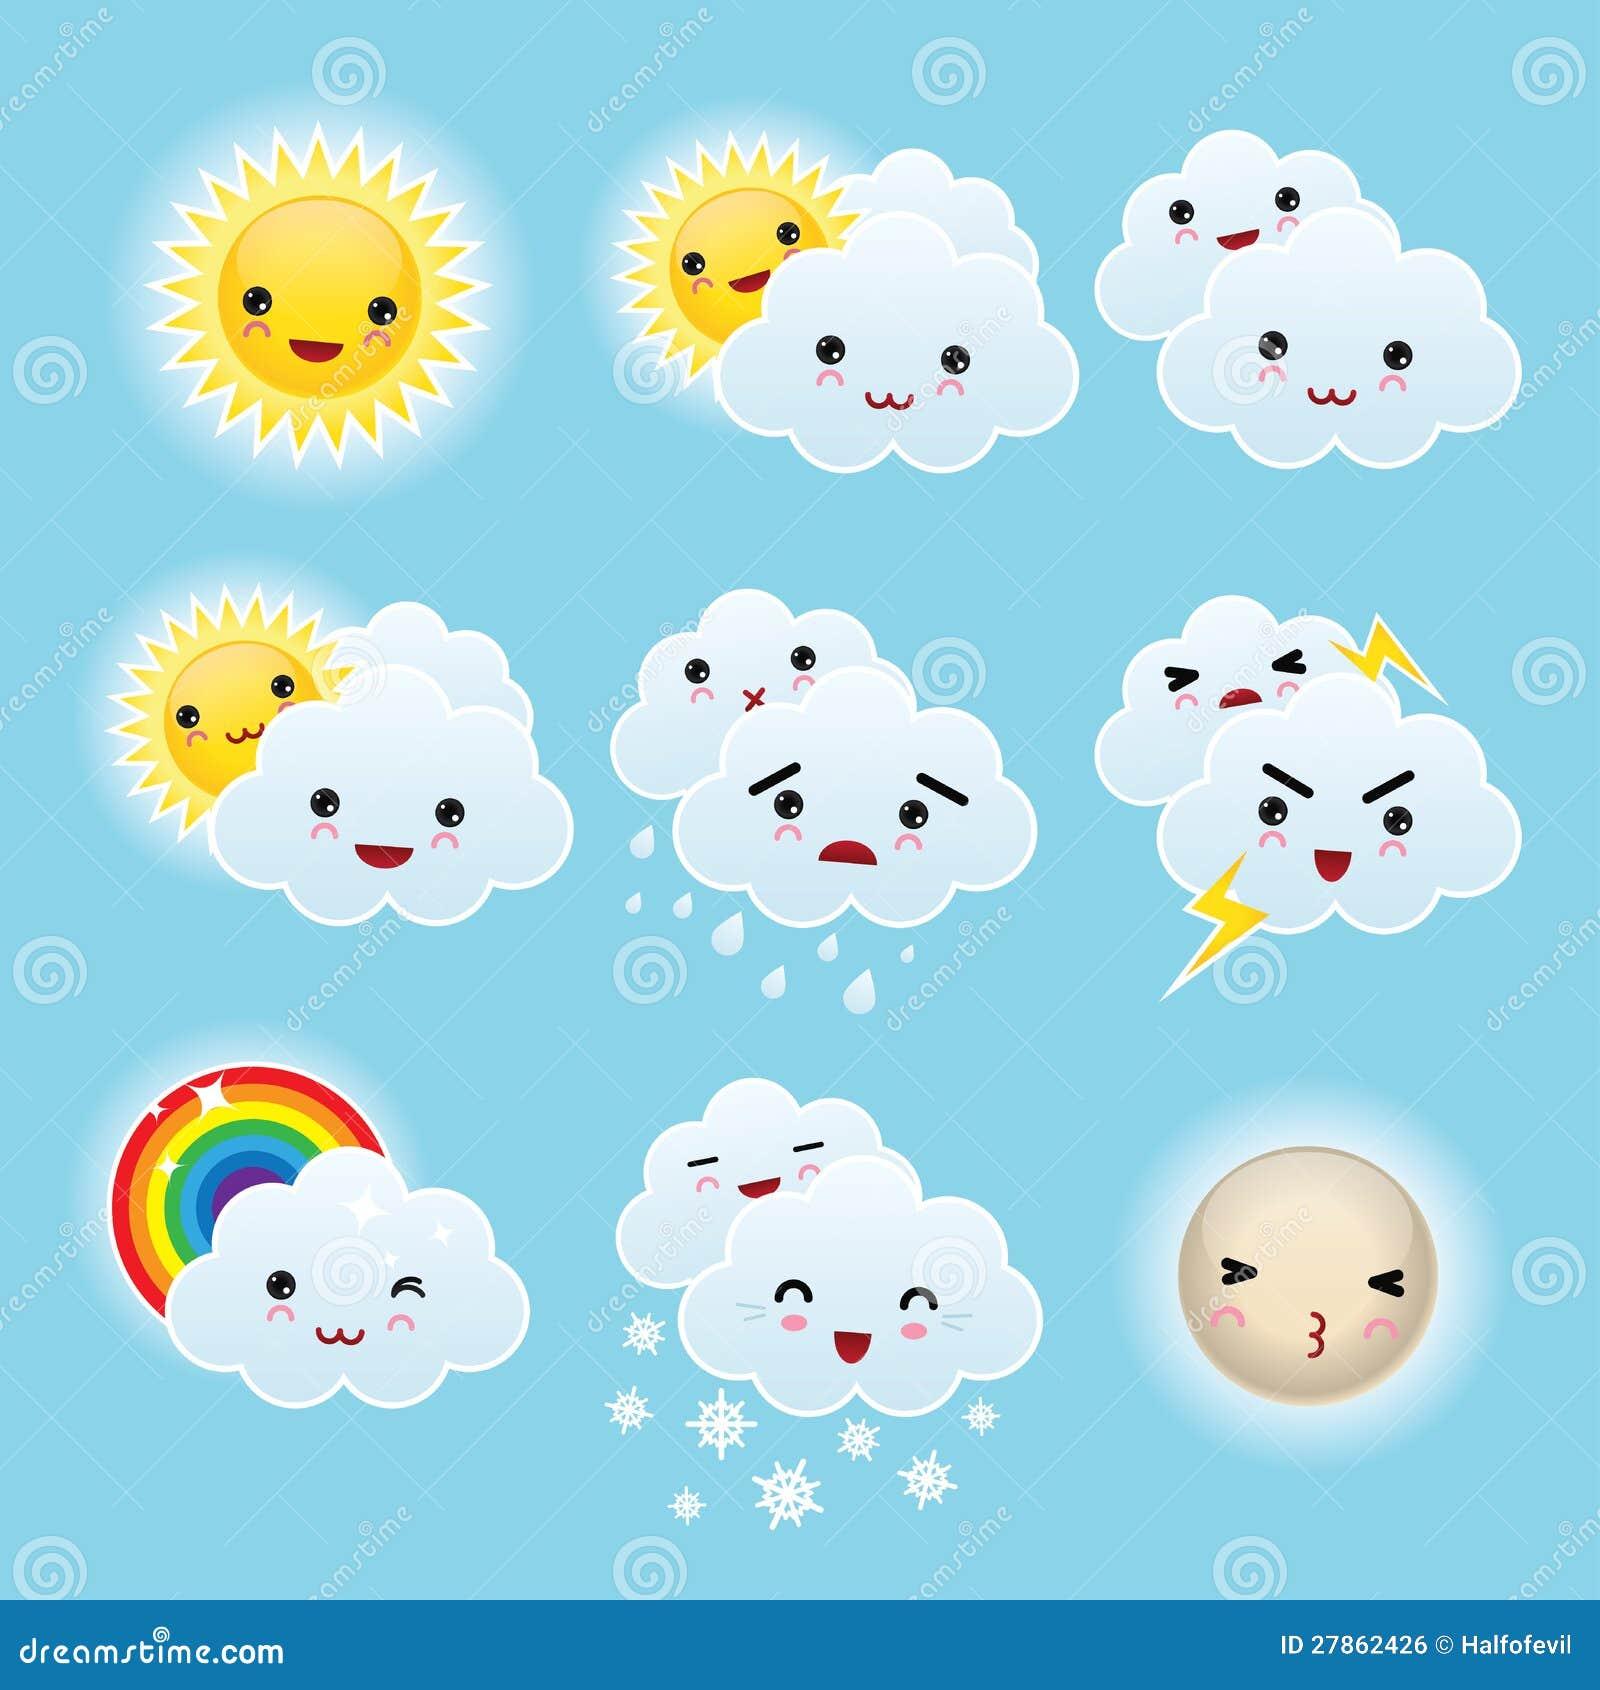 Nine Kid Kawaii Weather Icons Royalty Free Stock Image